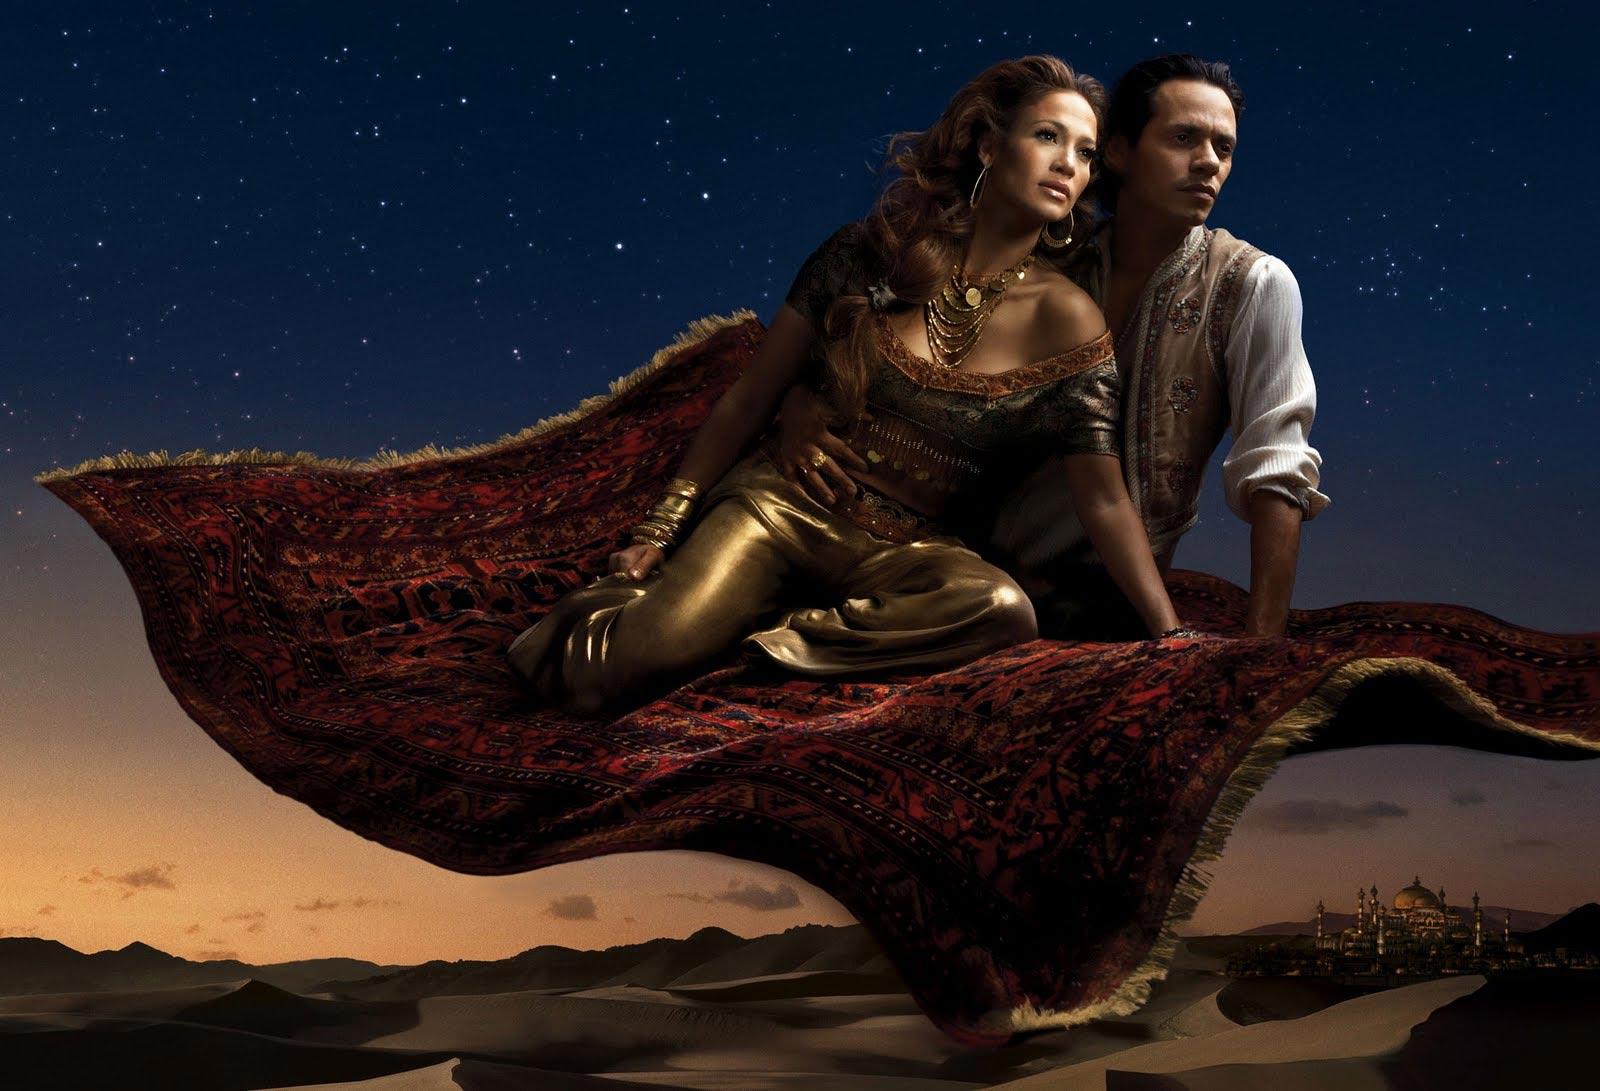 Jennifer-Lopez-as-Jasmine-and-Marc-Anthony-as-Aladdin.jpg